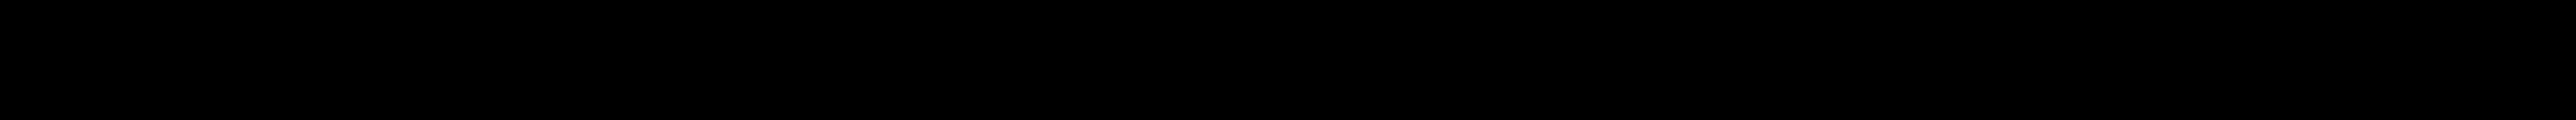 Label Pro XL Black Border